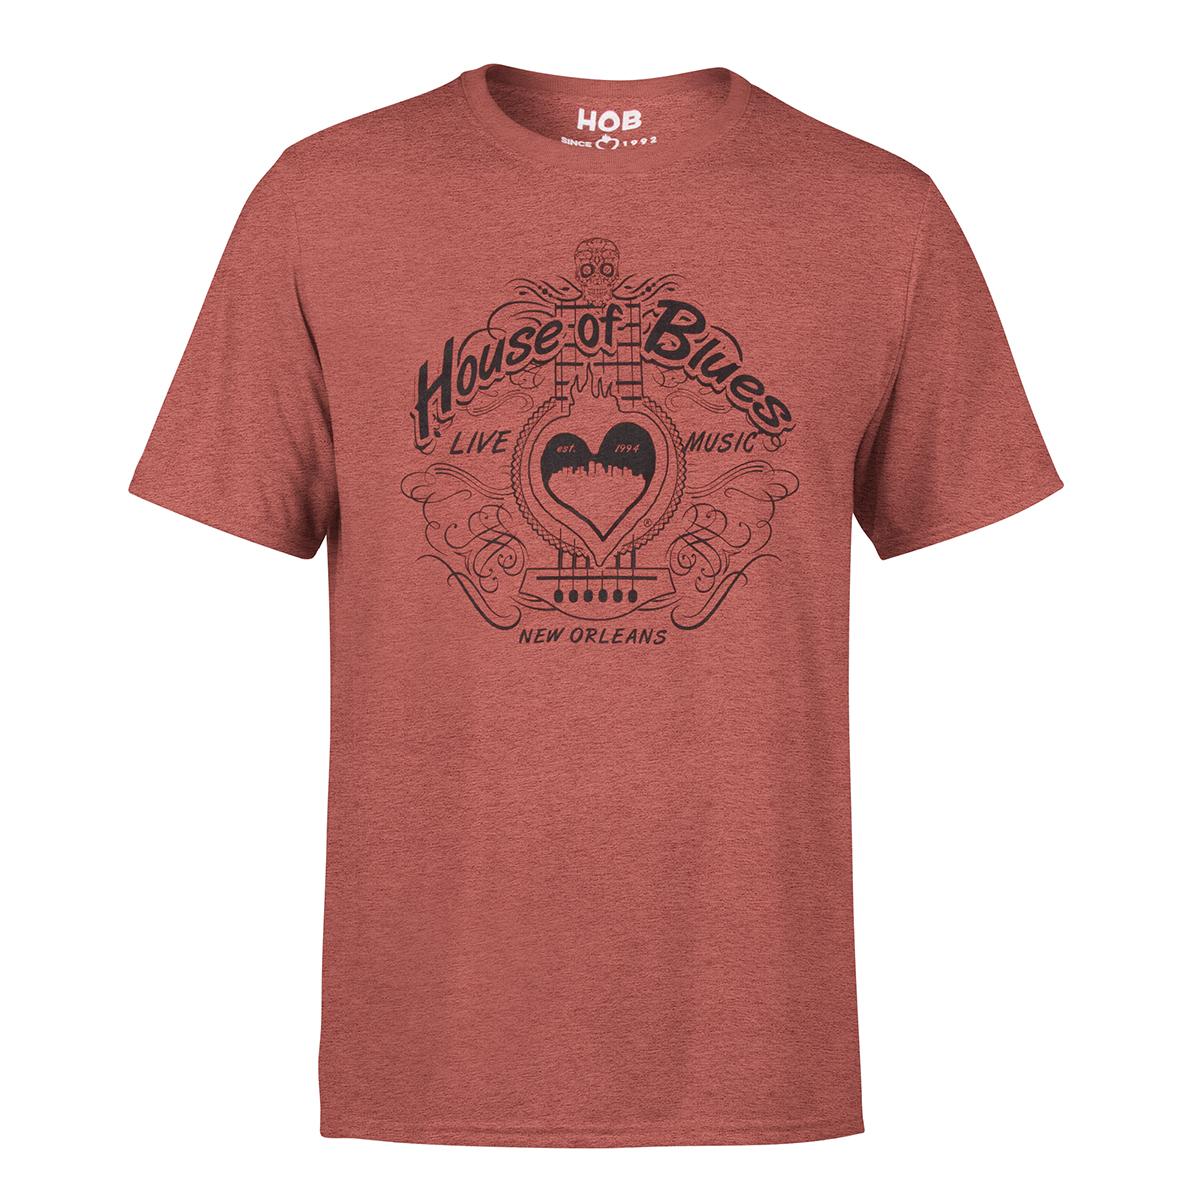 Swirl Shirt - New Orleans